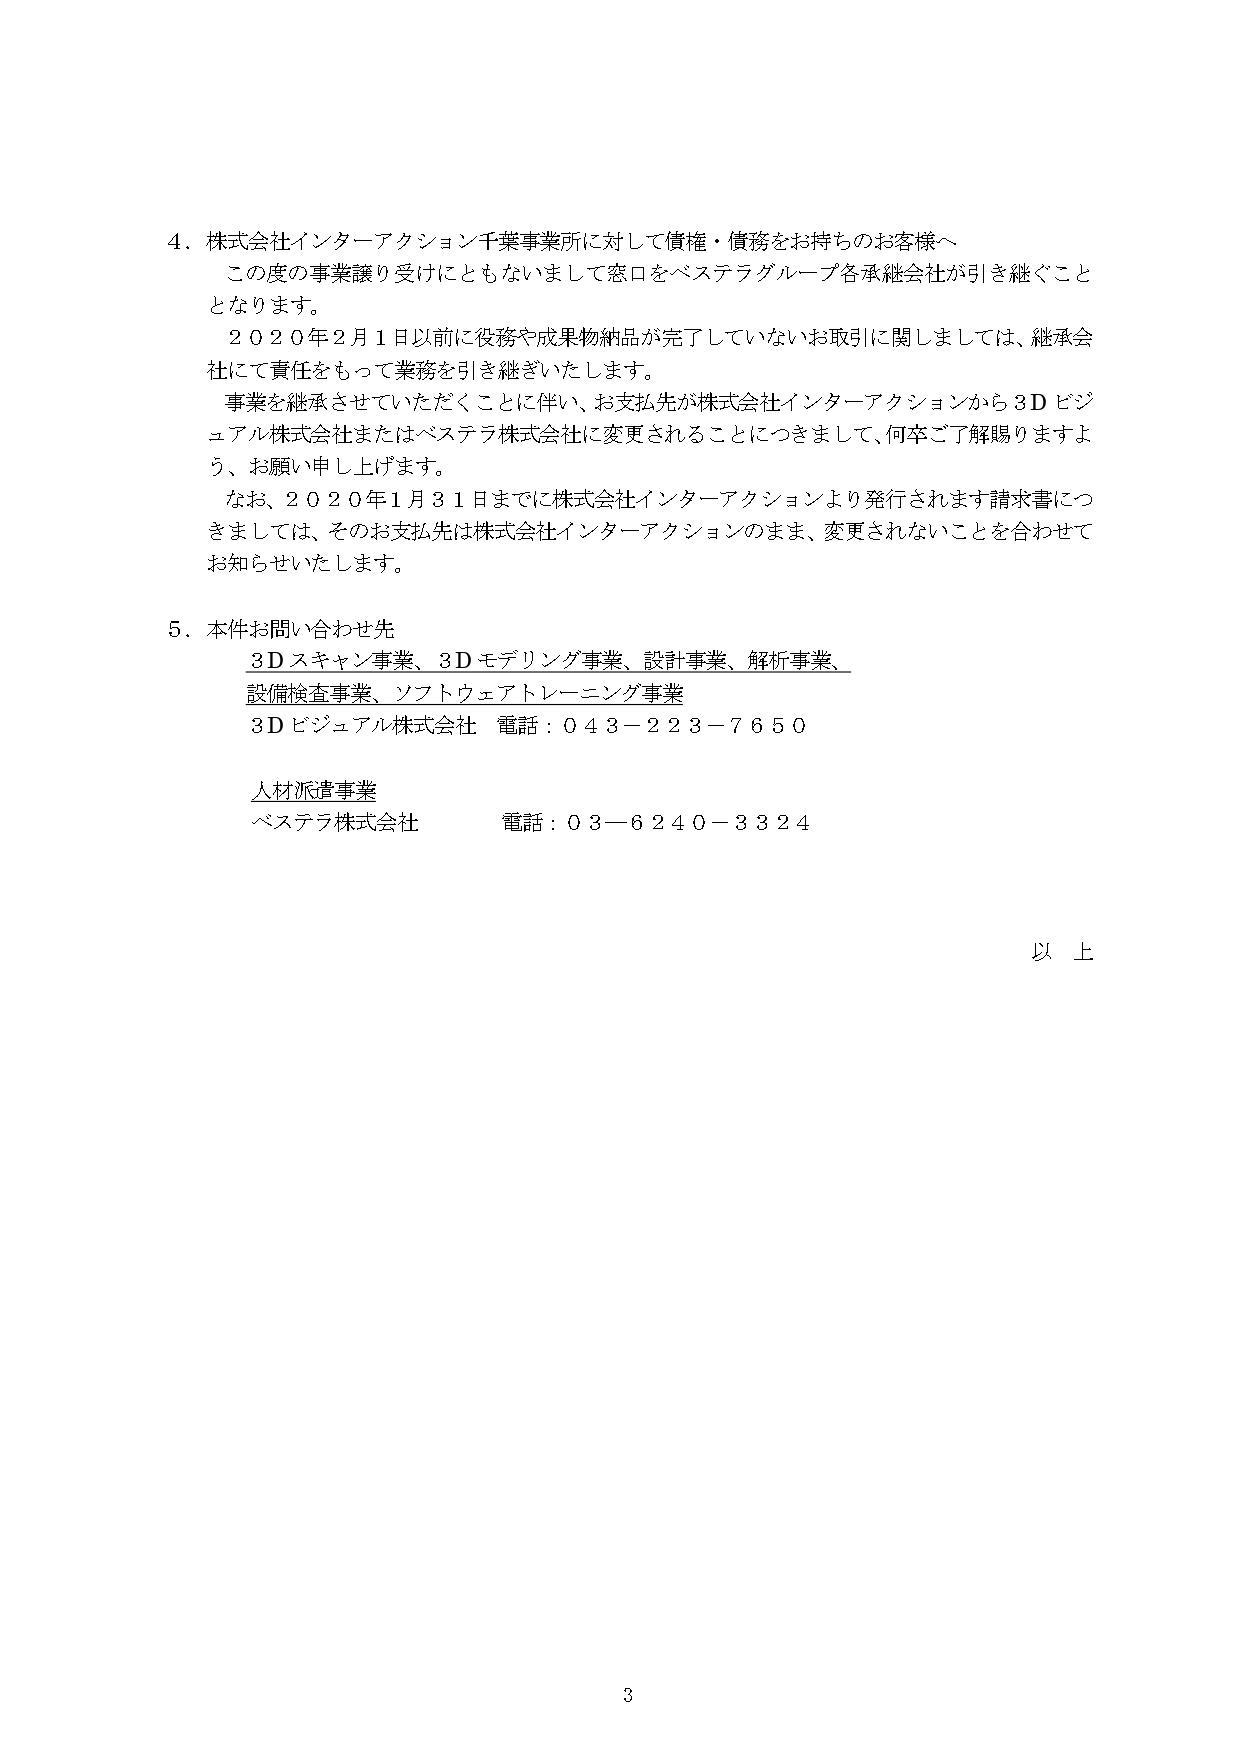 Microsoft Word - 莠区・ュ縺ョ蠑慕カ吶℃縺ォ髢「縺吶k縺疲。亥・・茨シ泥繝薙ず繝・繧「繝ォ・・00123謾ケ螳喟page-0003.jpg